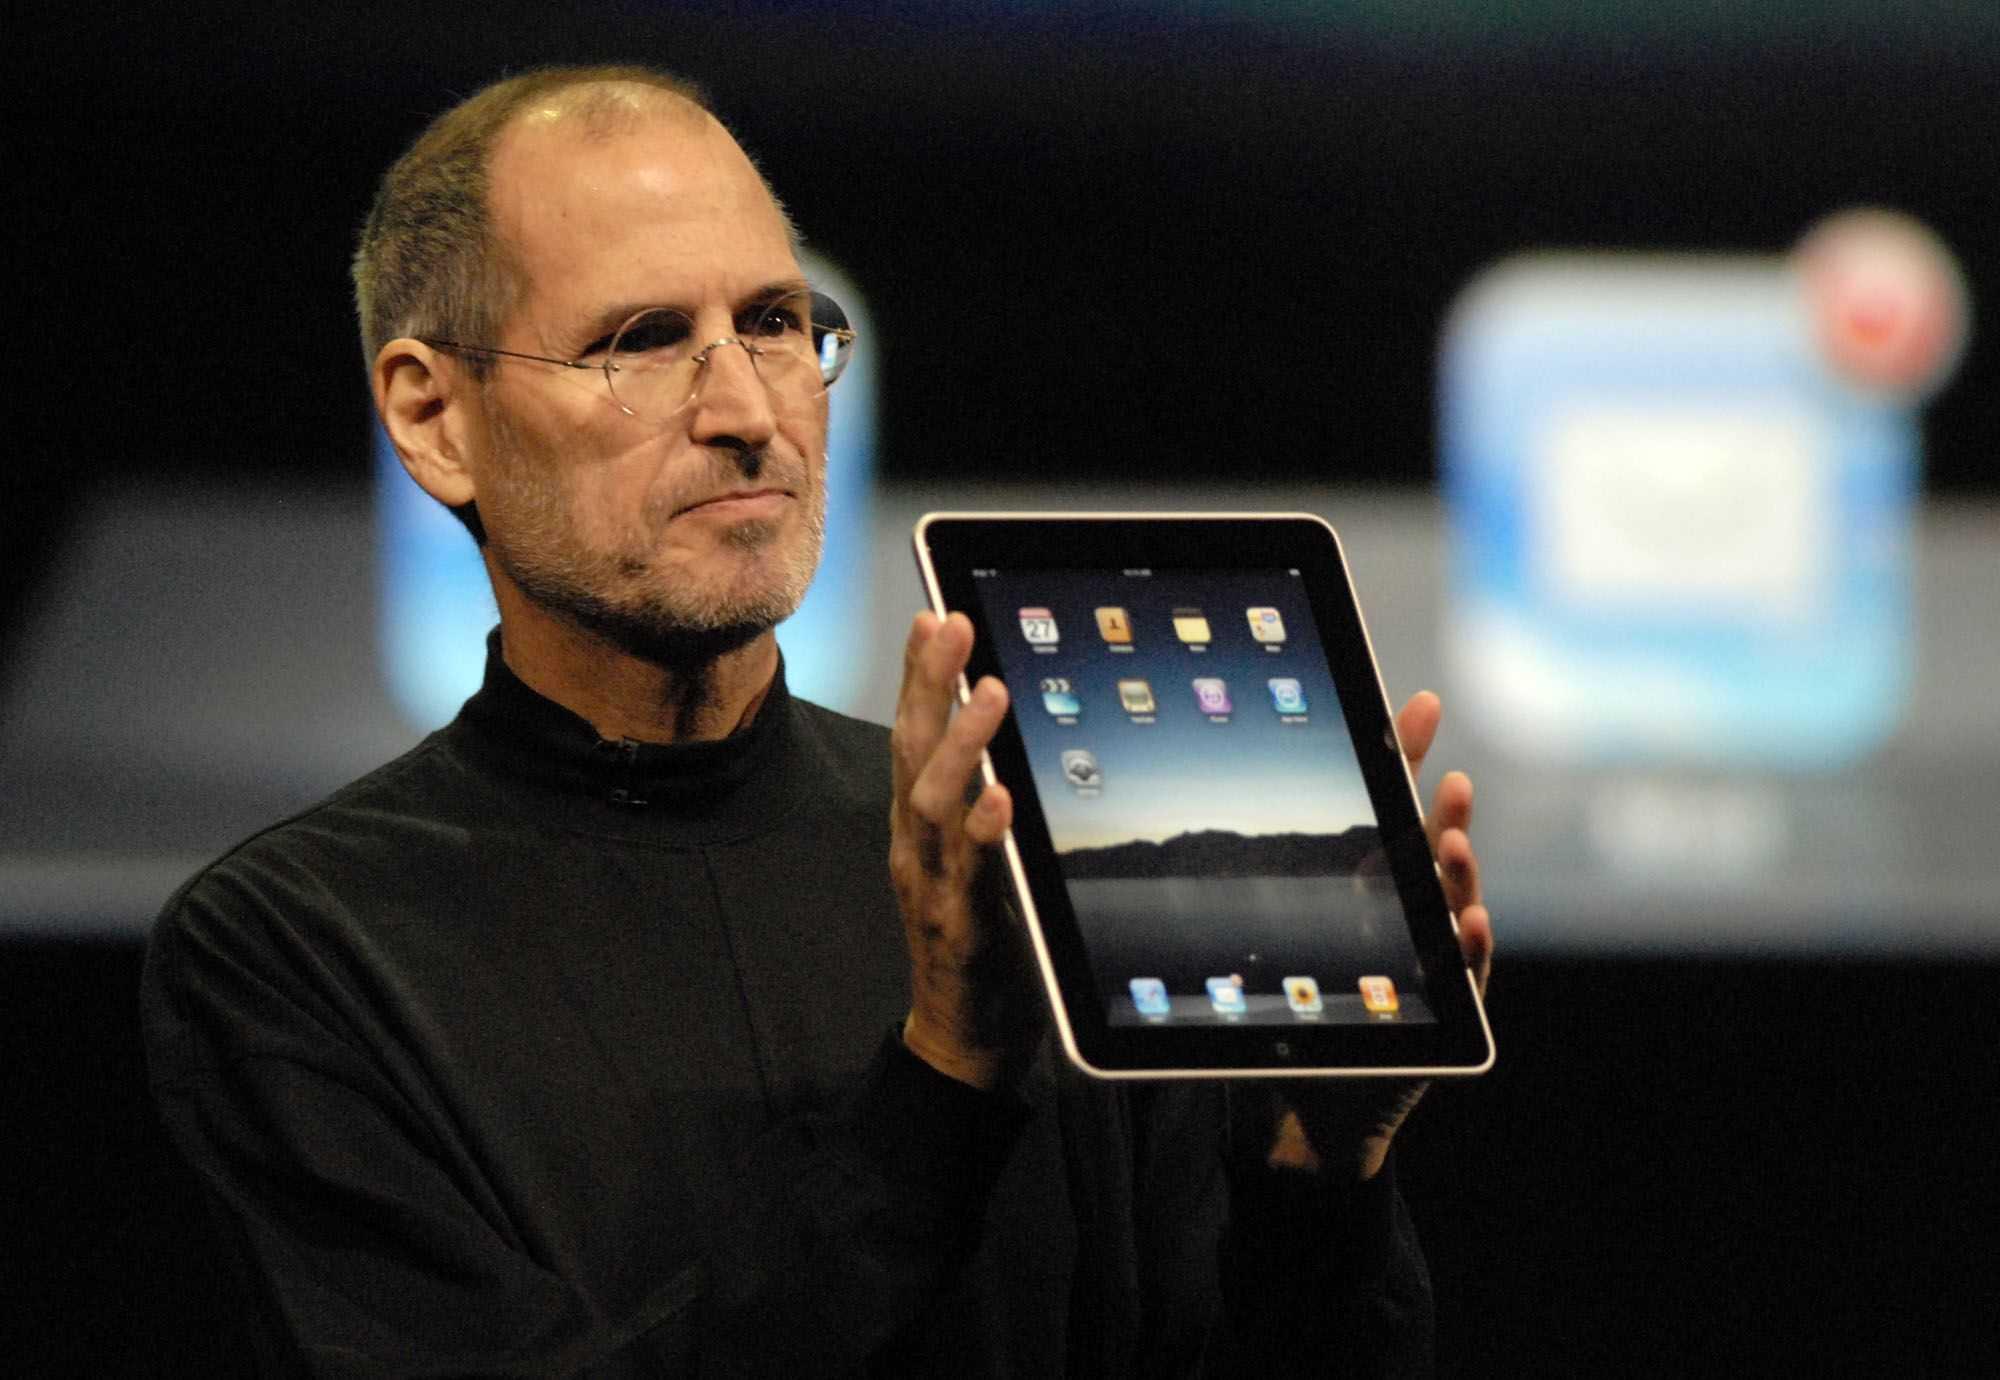 Сравнение камер iphone 11 и iphone 11 pro / 11 pro max. может достаточно двух? | новости apple. все о mac, iphone, ipad, ios, macos и apple tv